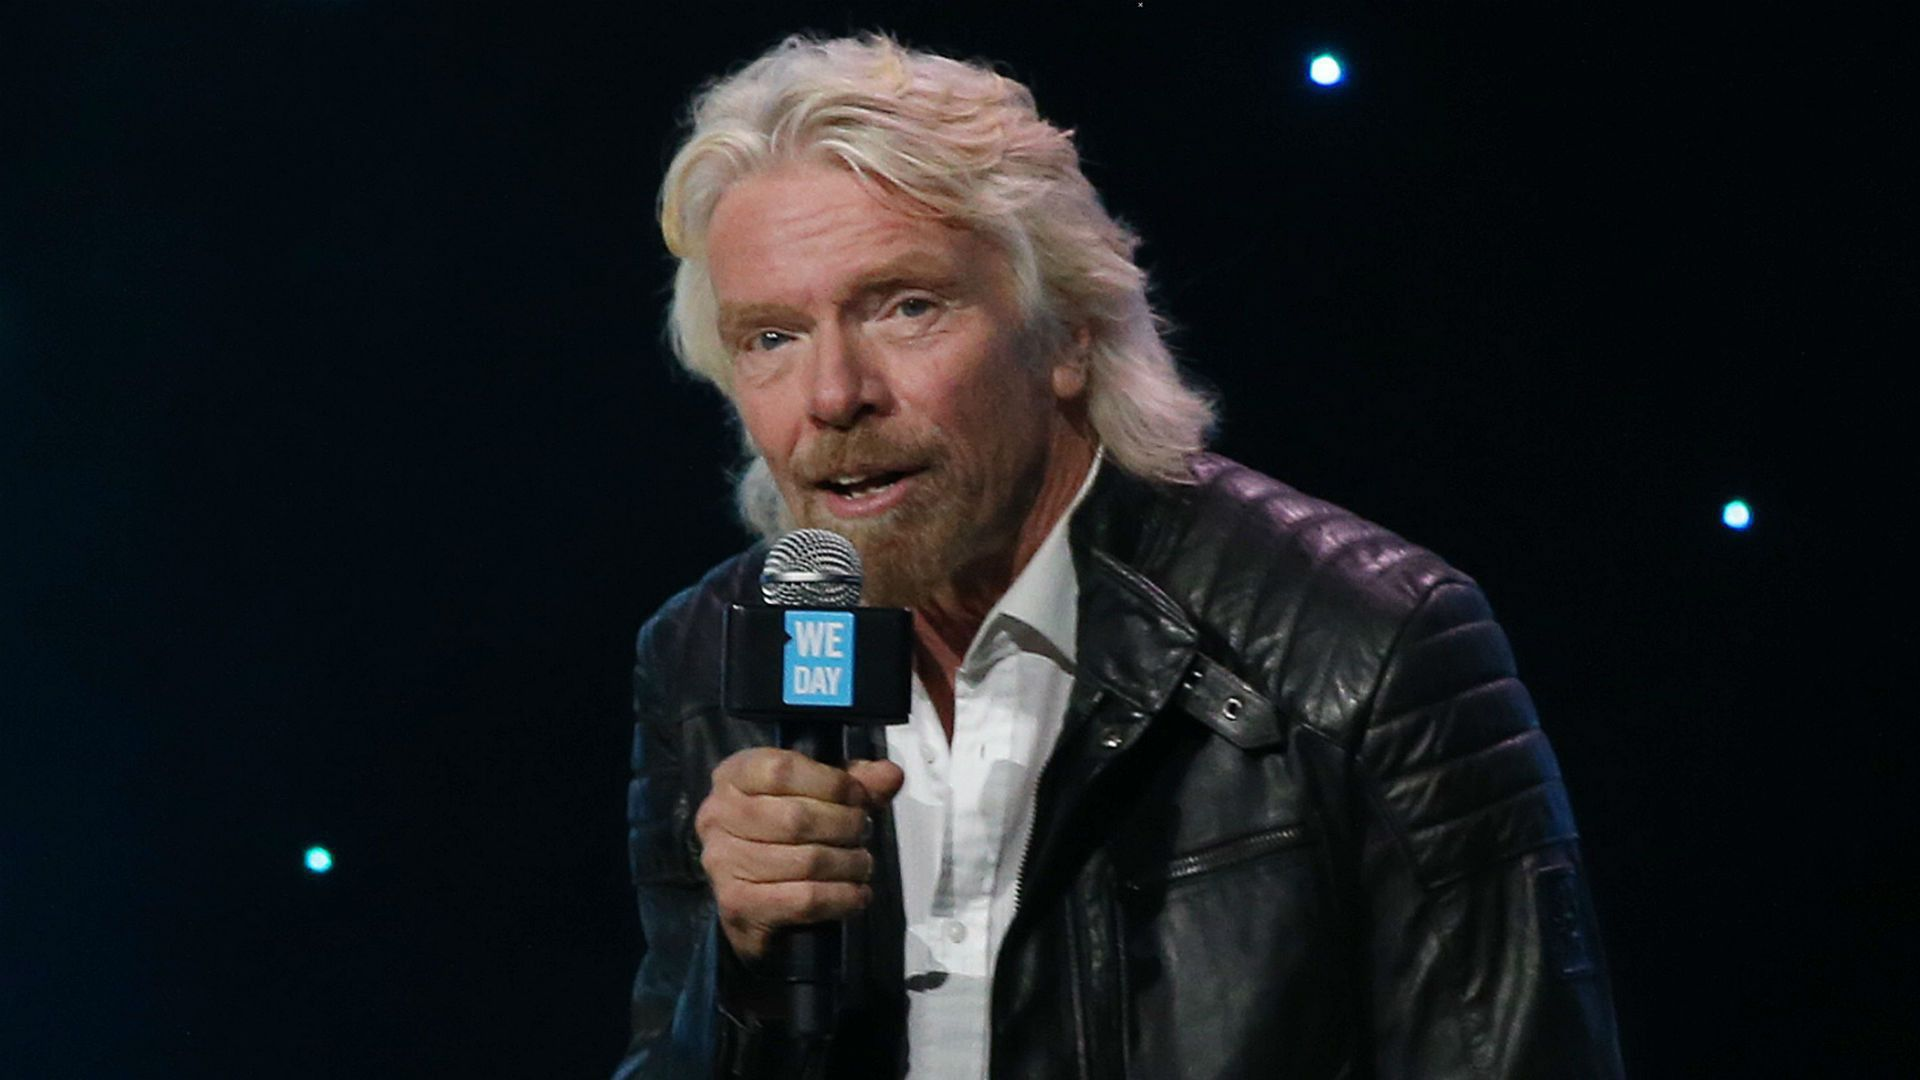 Richard Branson Full Hd